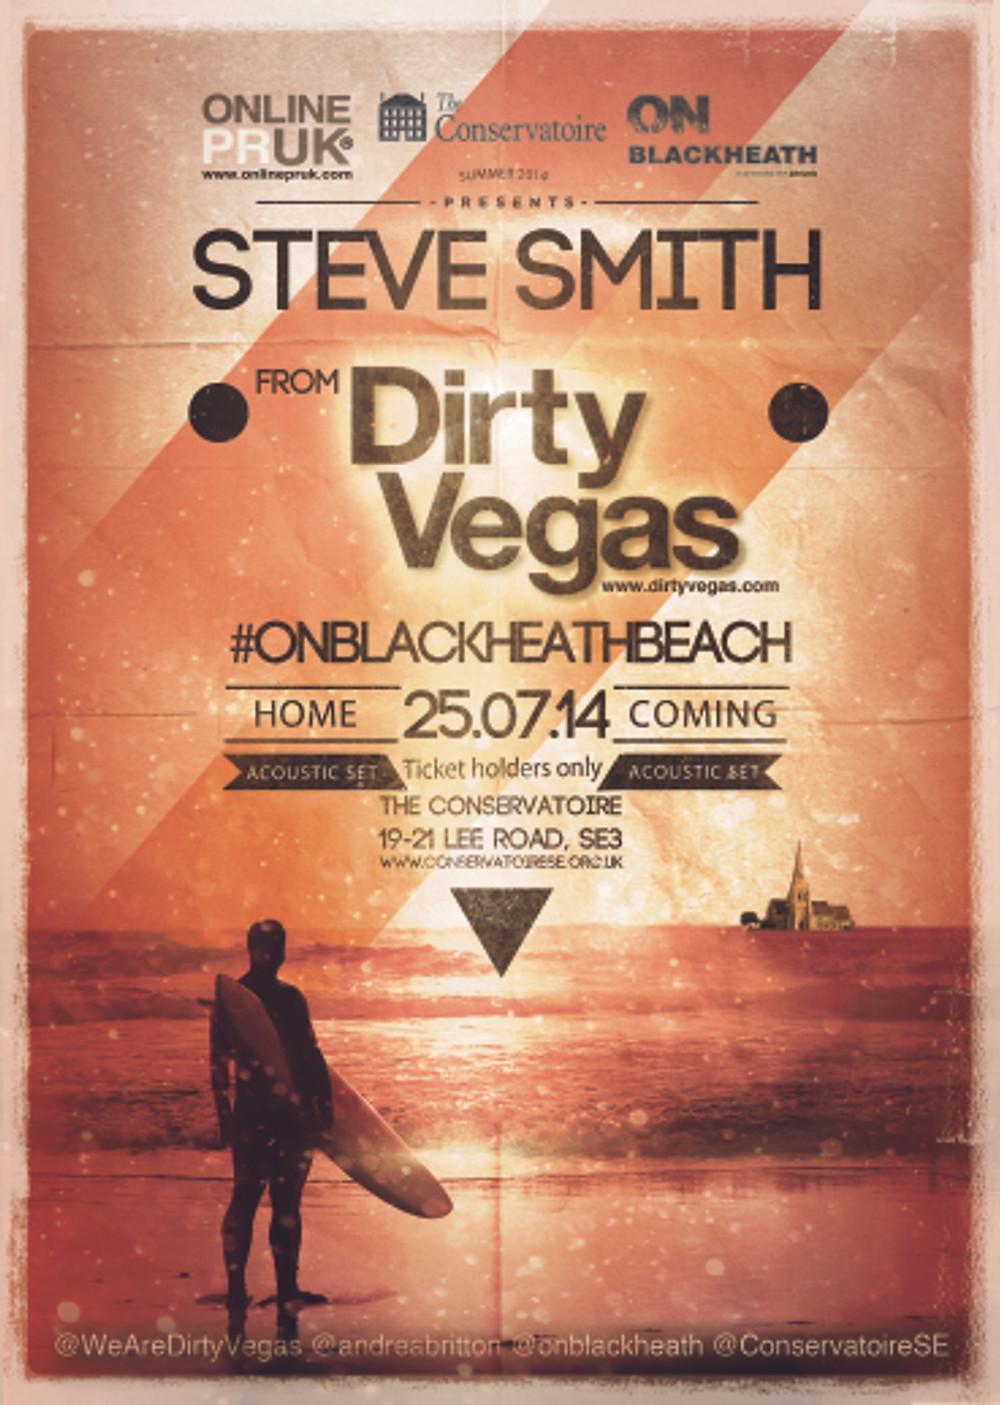 steve smith dirty vegas #onblackheathbeach